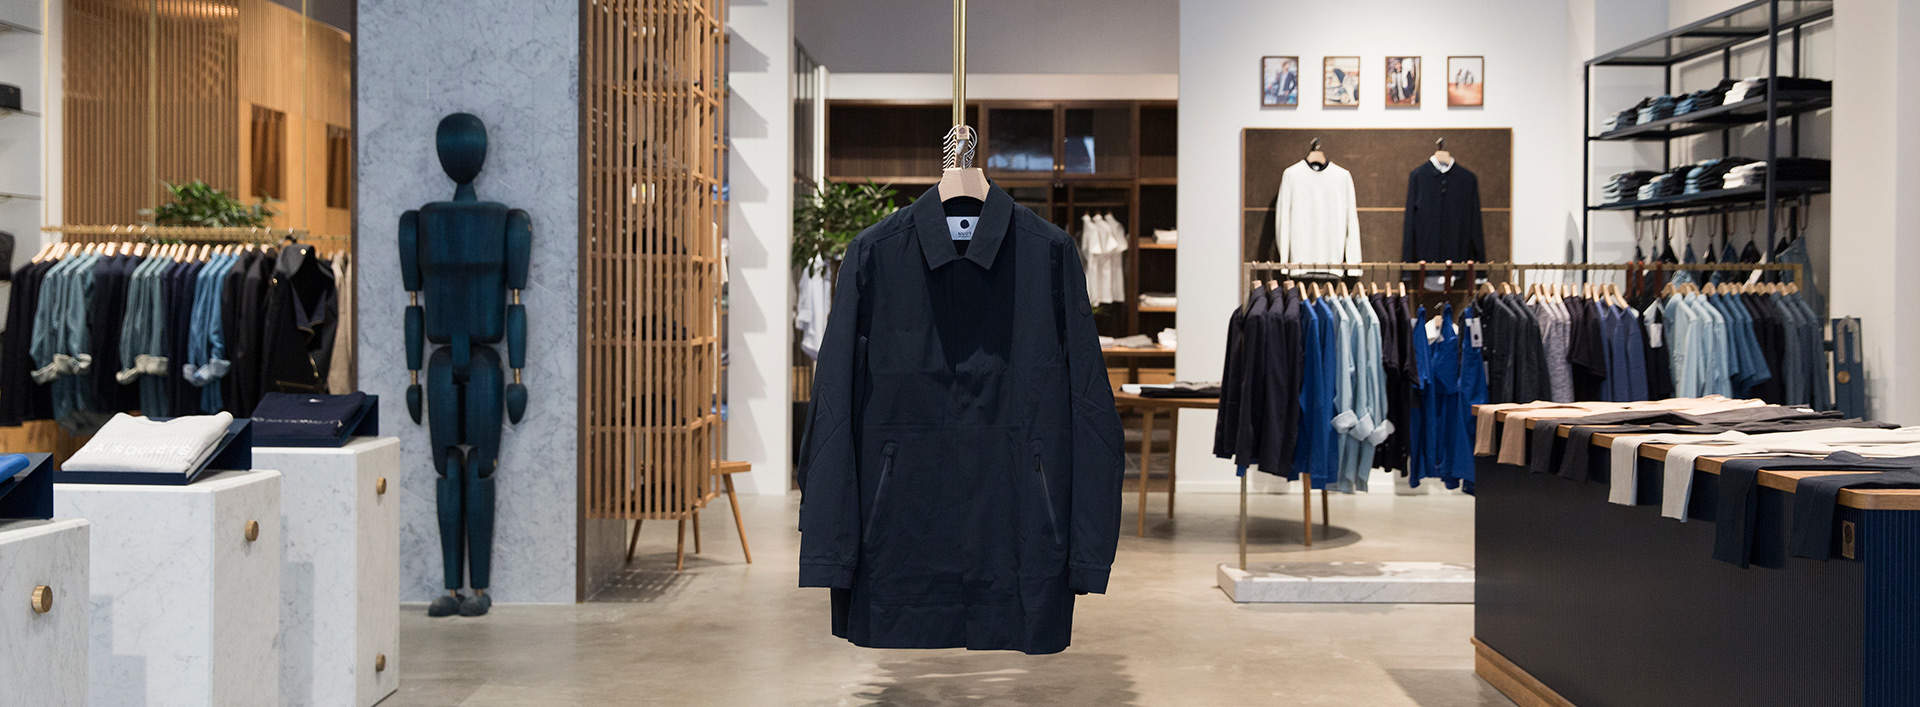 concept store 9